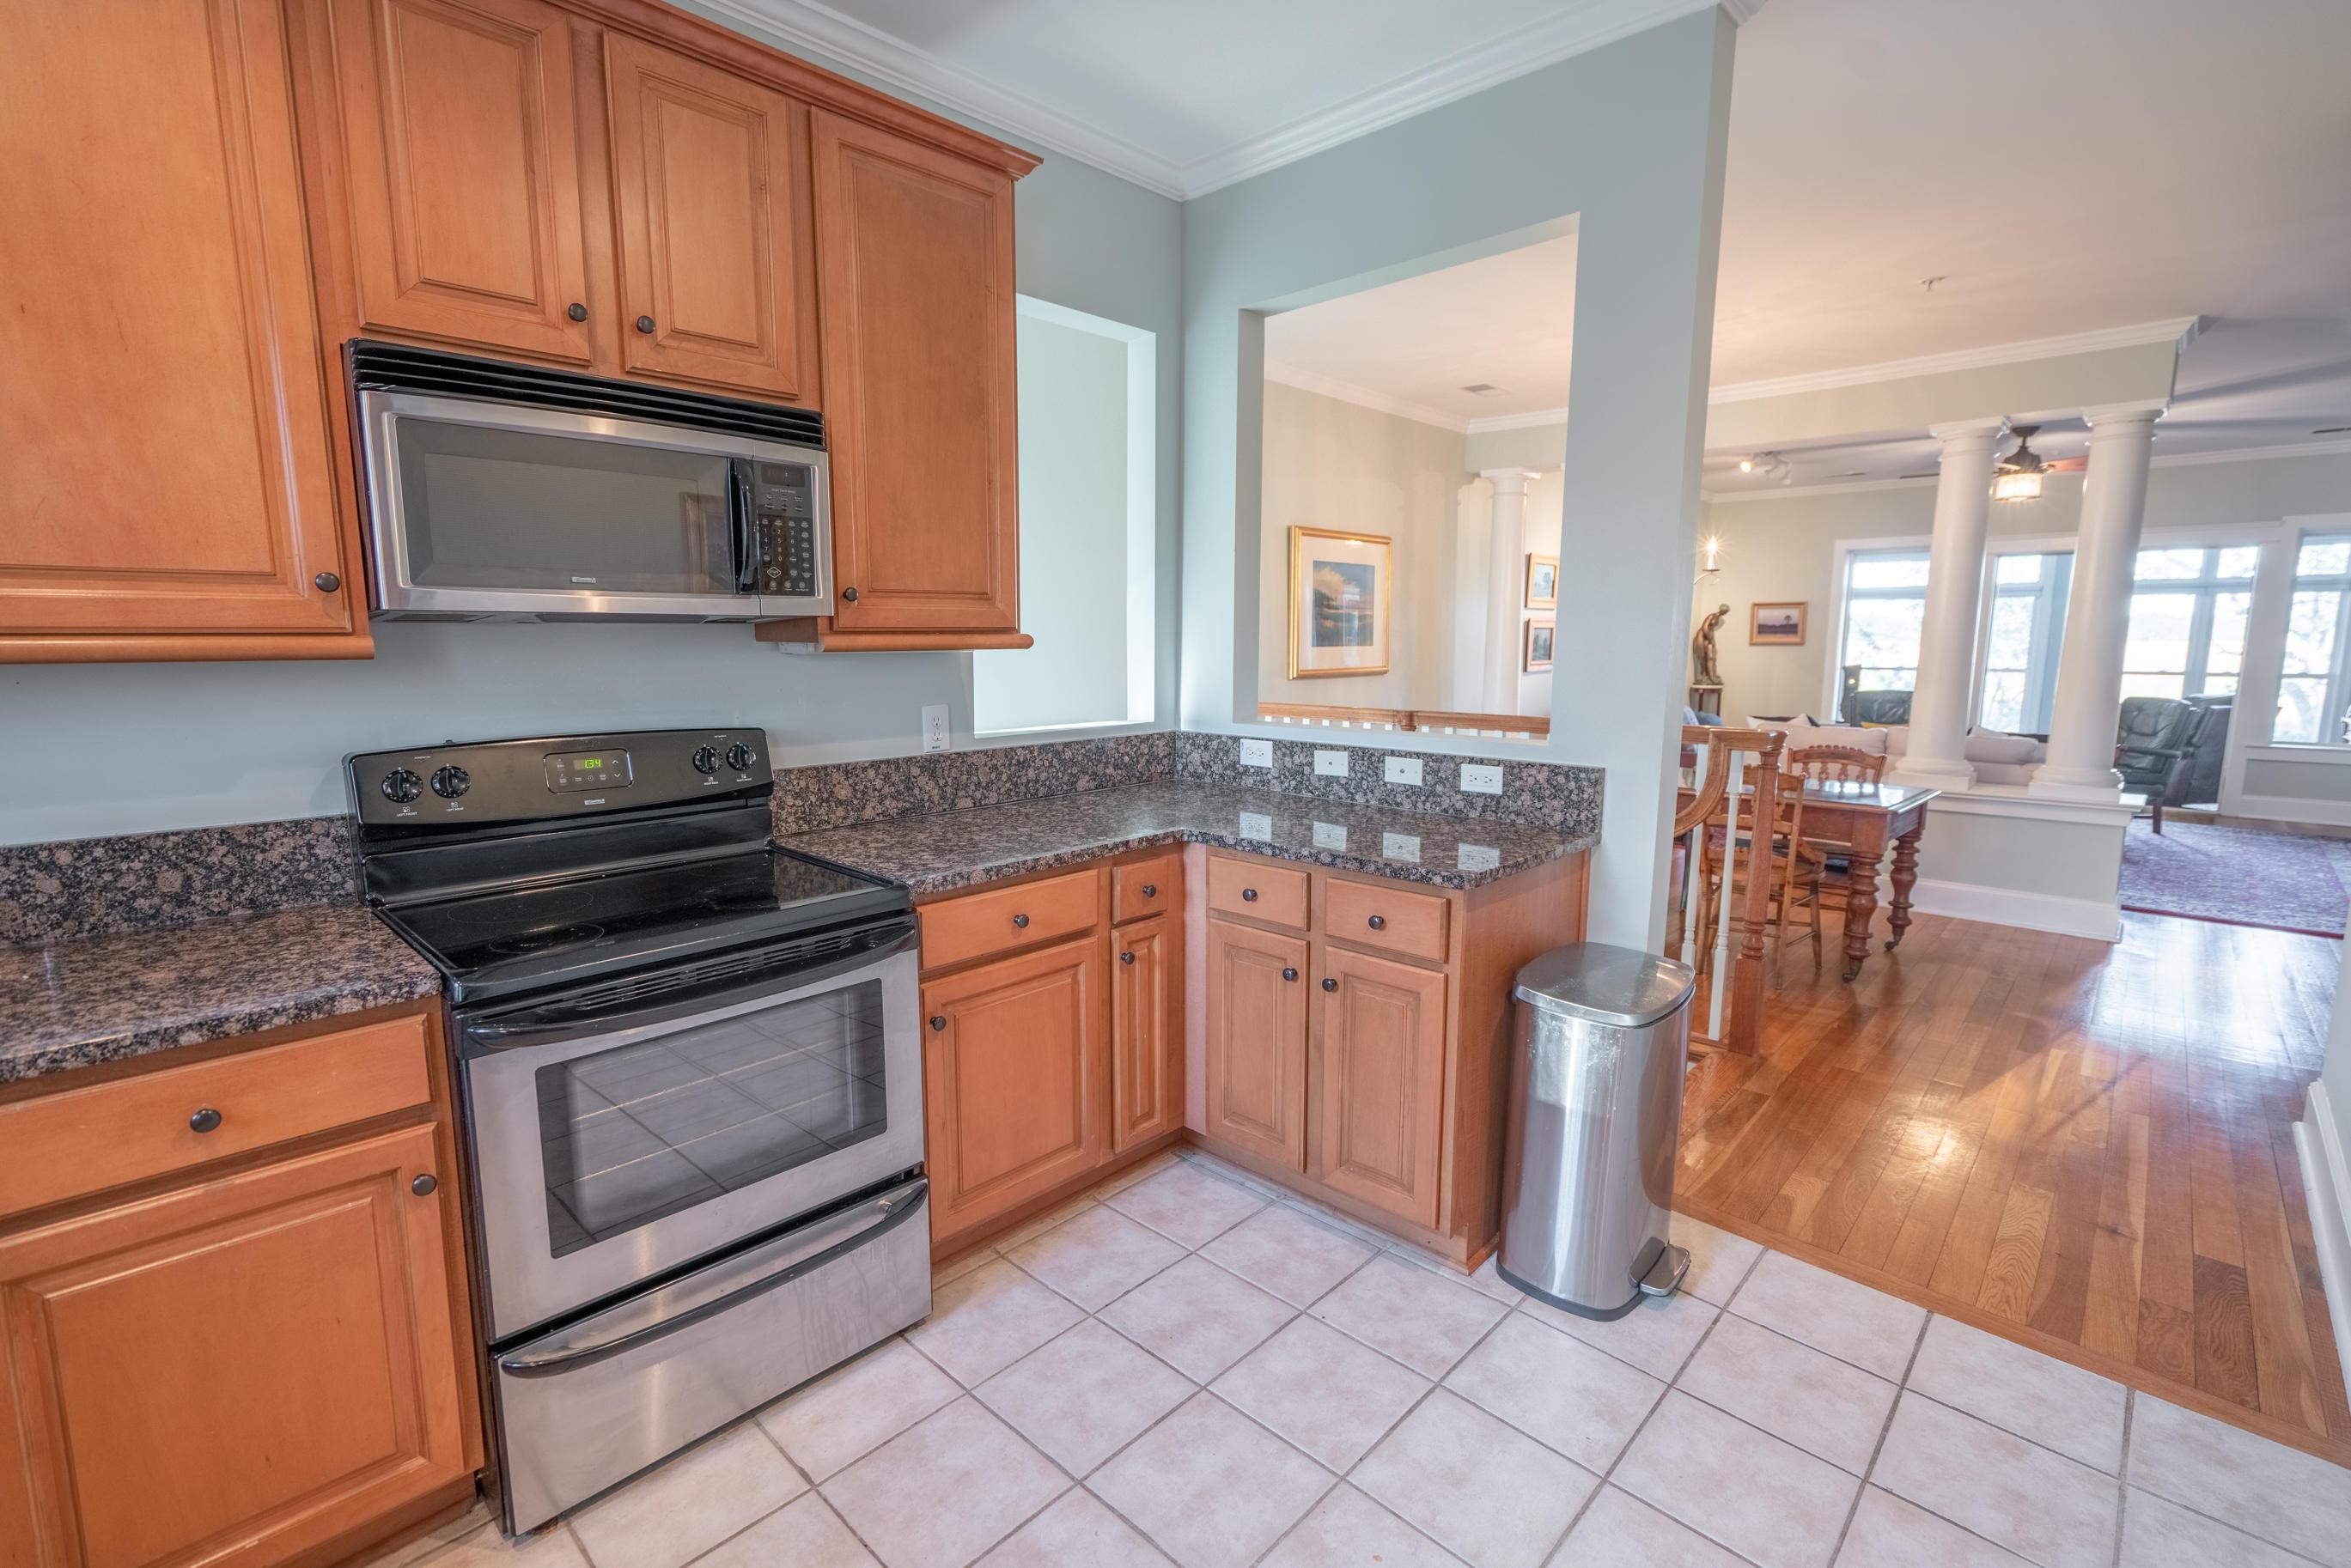 Etiwan Pointe Homes For Sale - 132 Winding Creek, Mount Pleasant, SC - 26